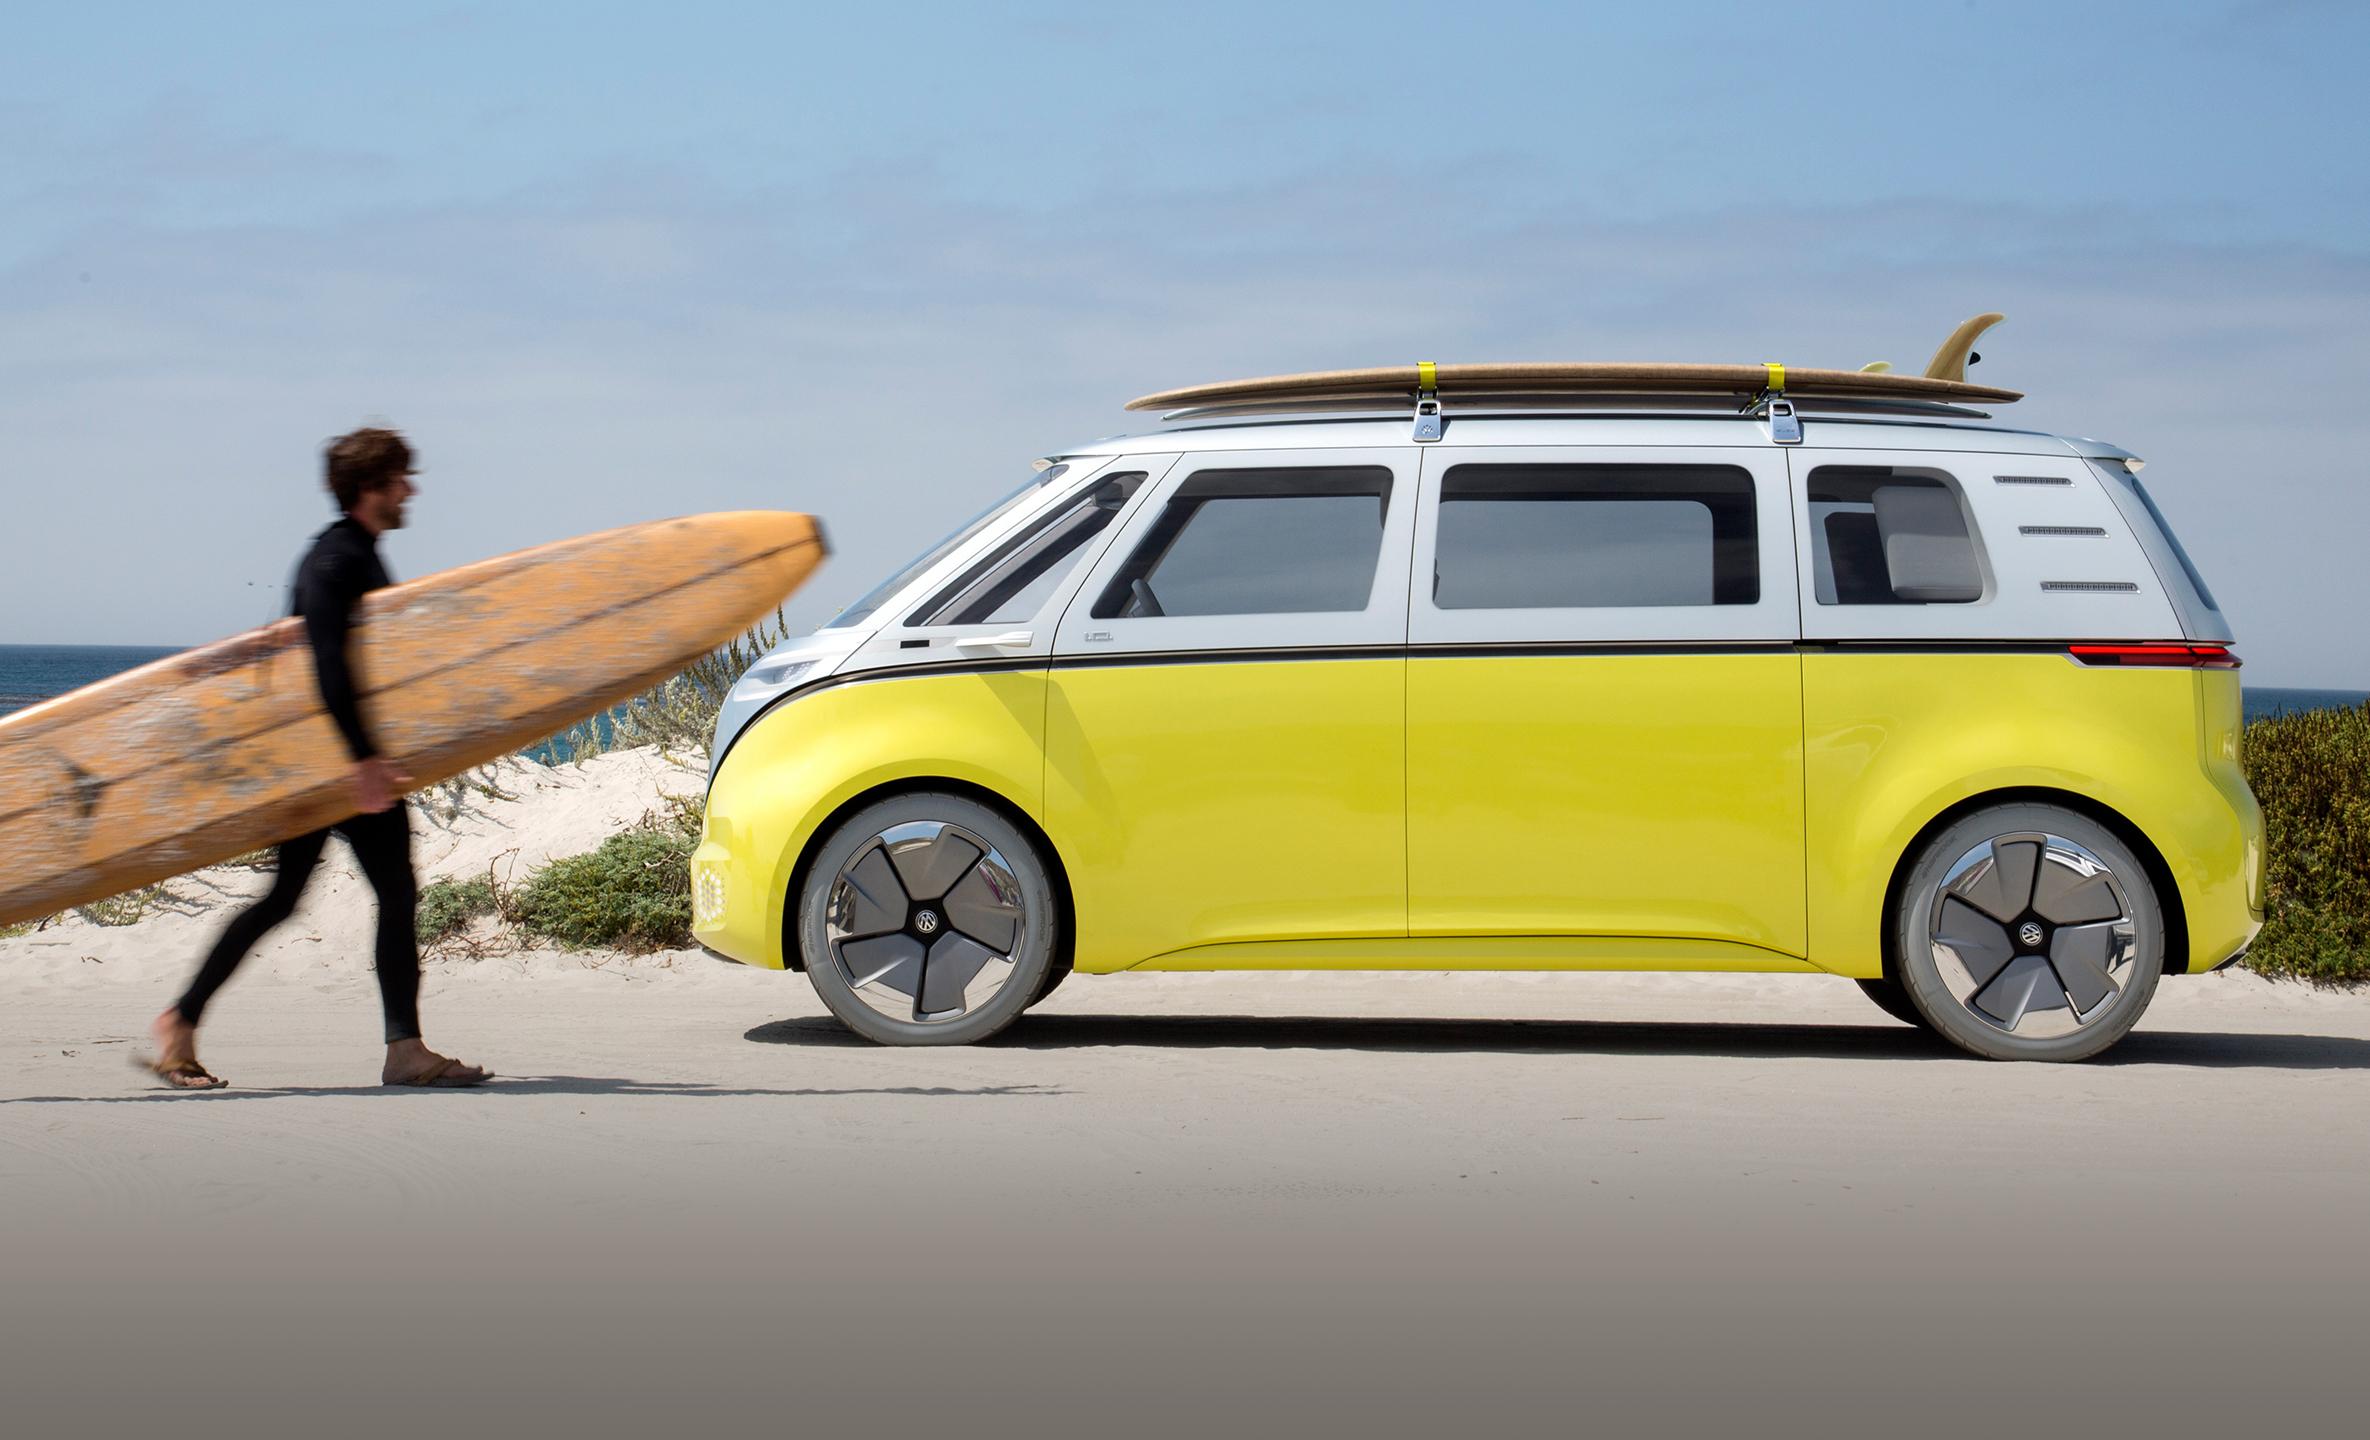 2022 VW Microbus Concept